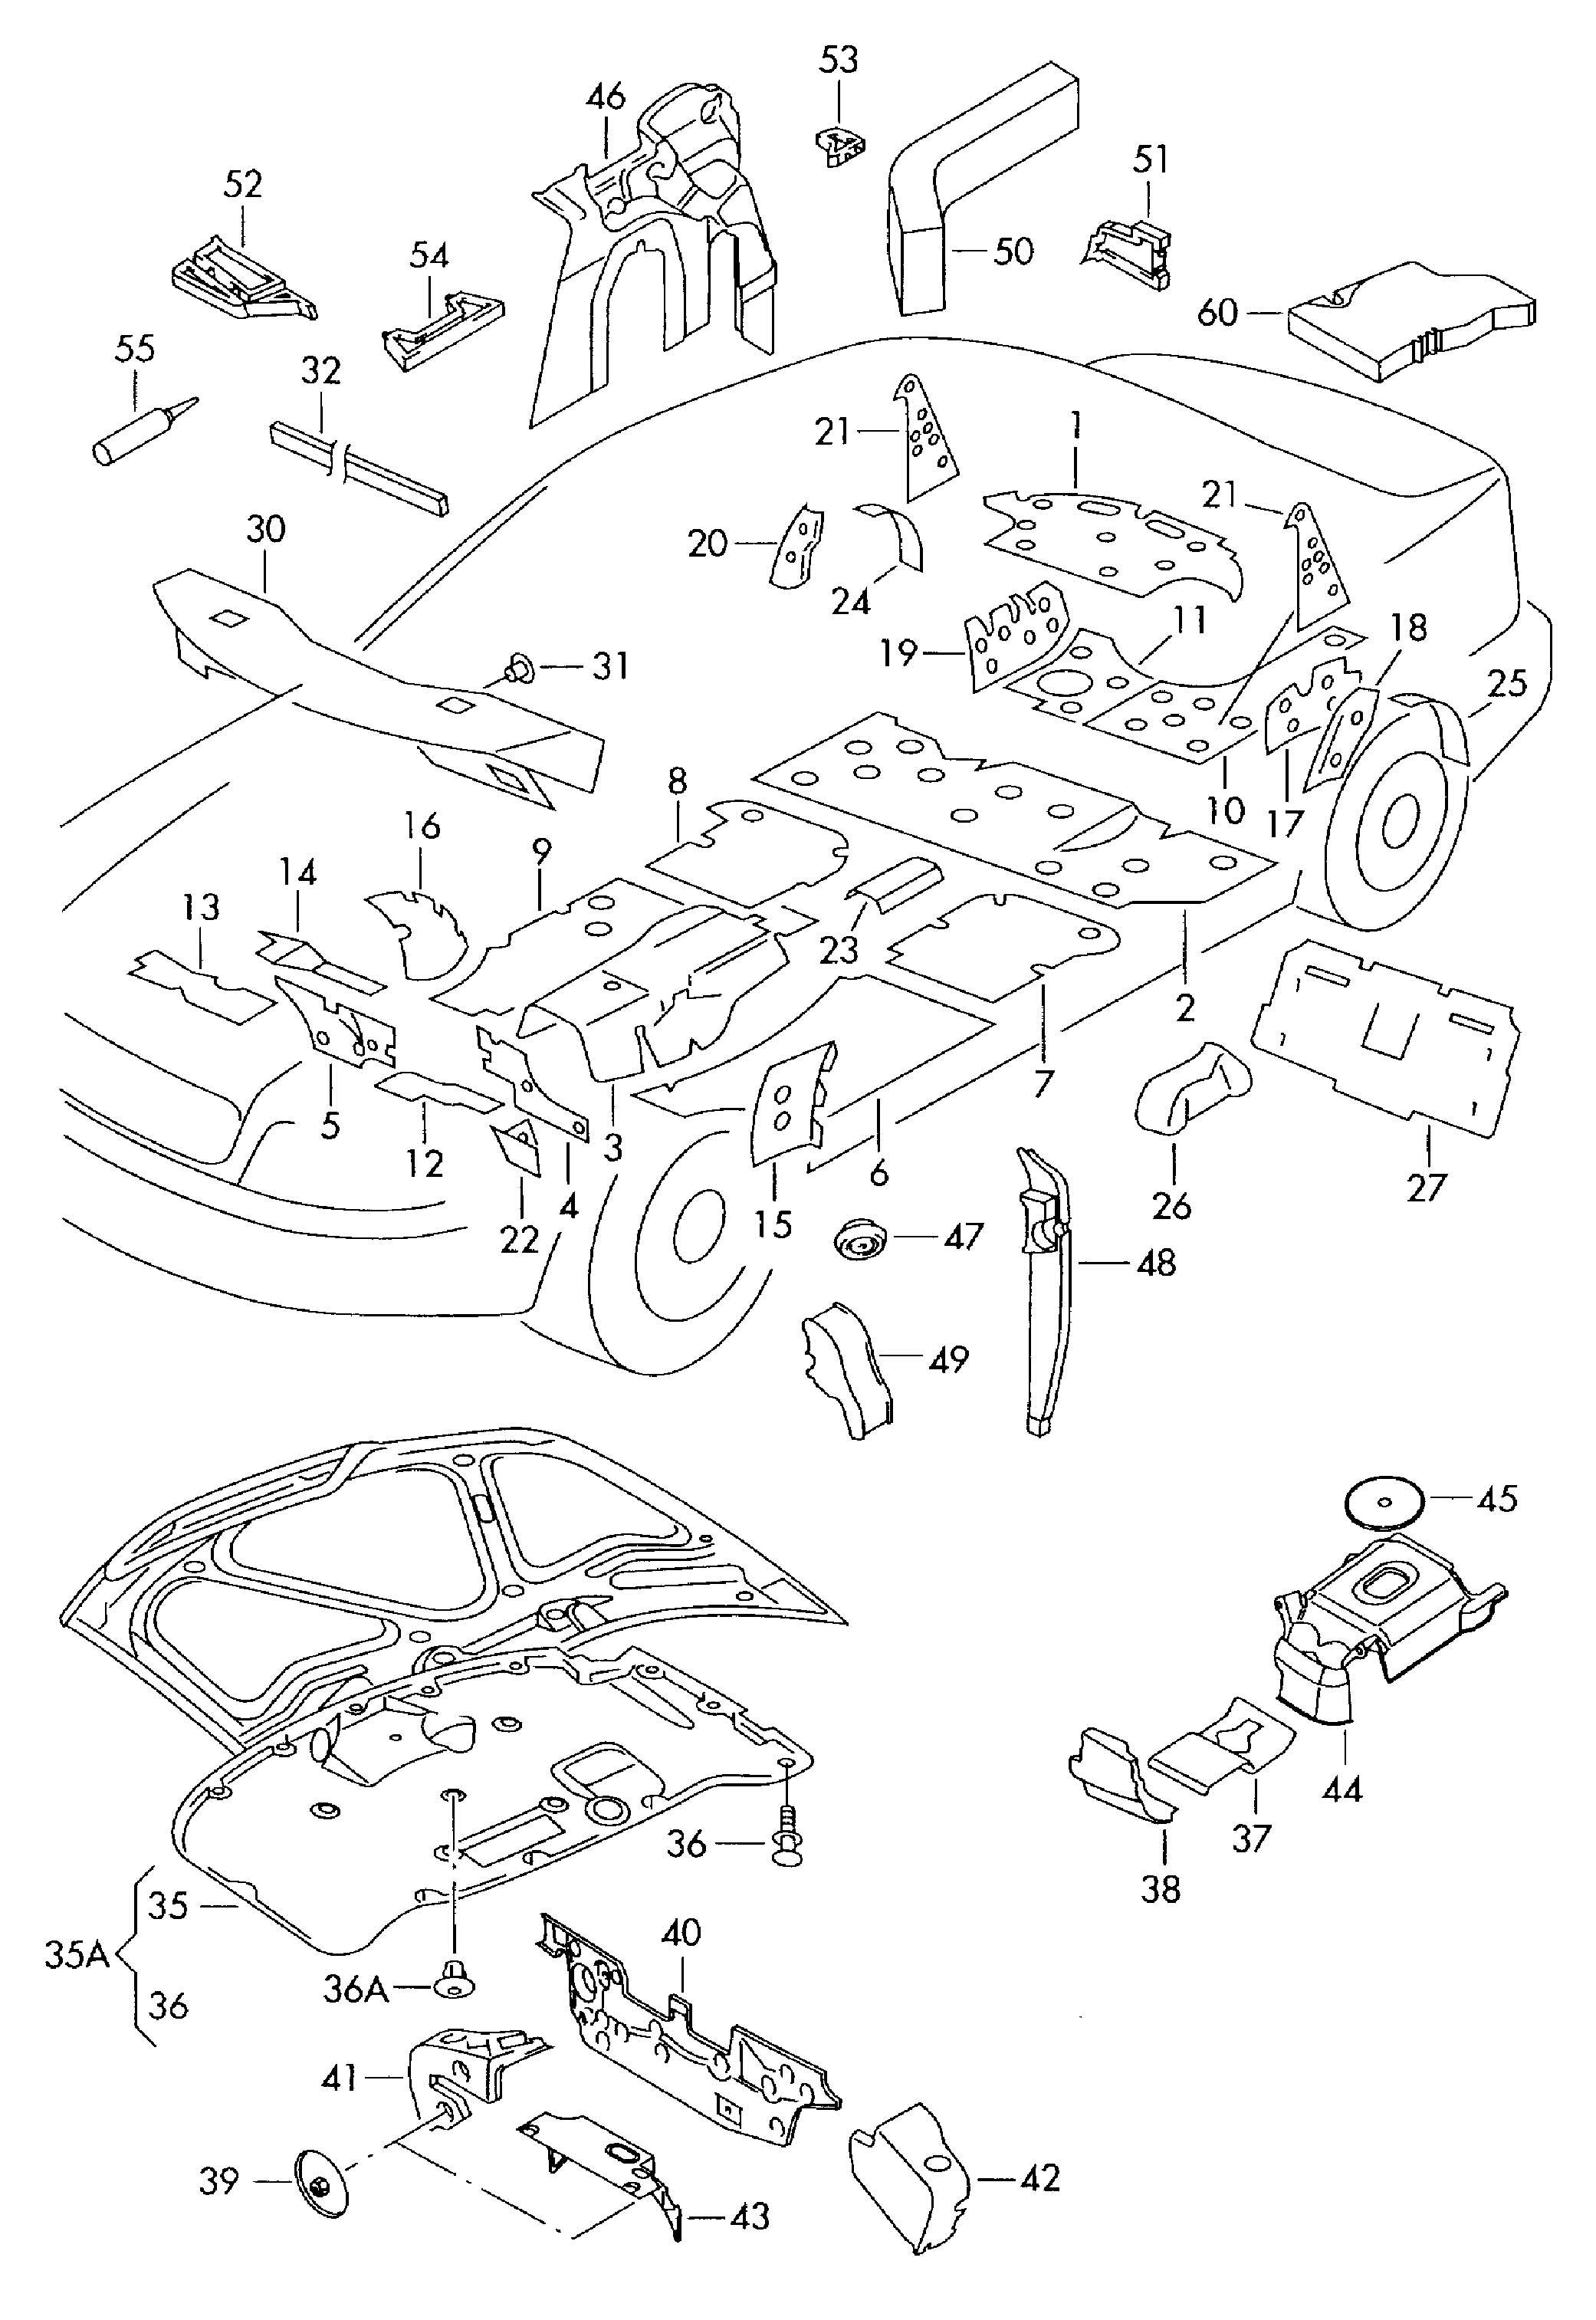 Volkswagen Passat Sealing Cord Adhesives And Sealing